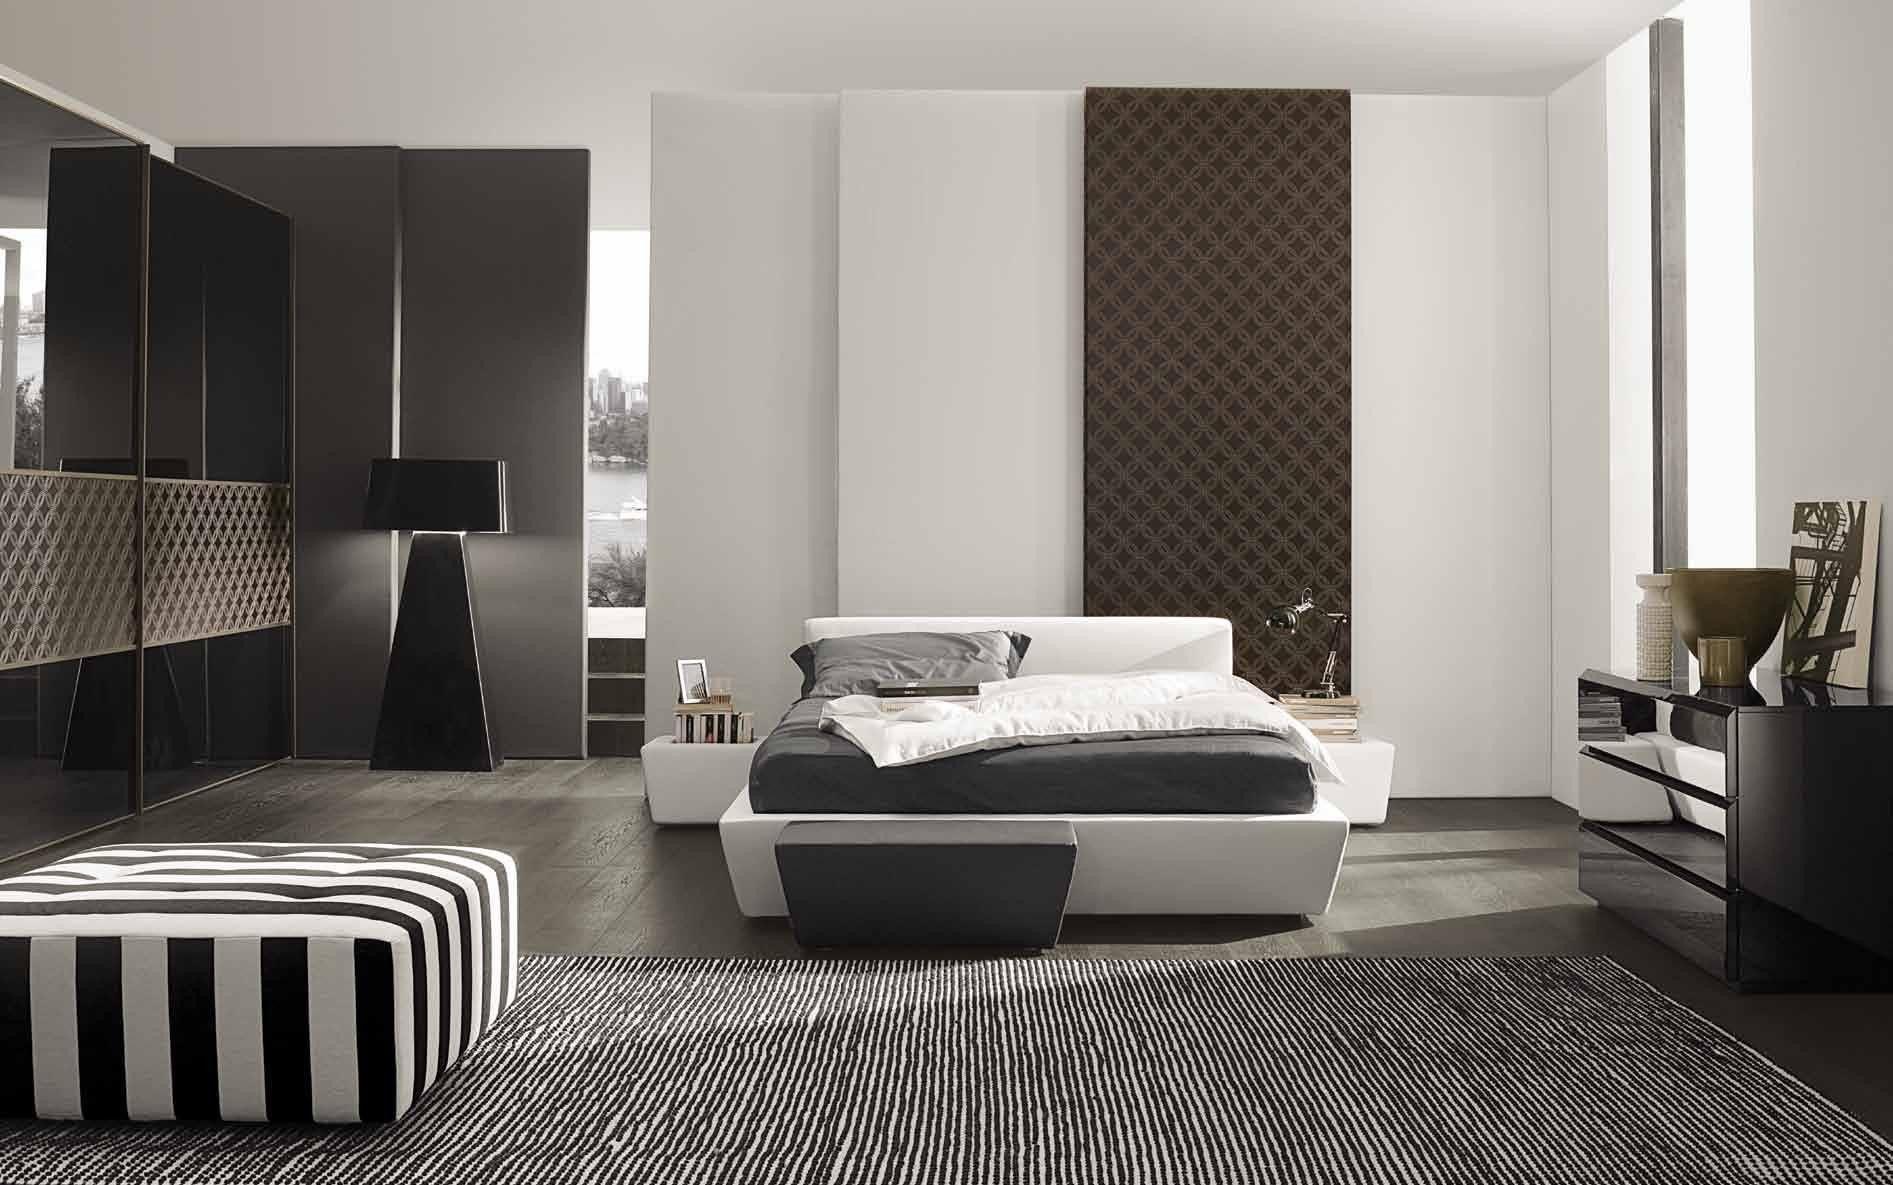 30 brilliant image of bedroom ideas for men bedroom furniture rh in pinterest com